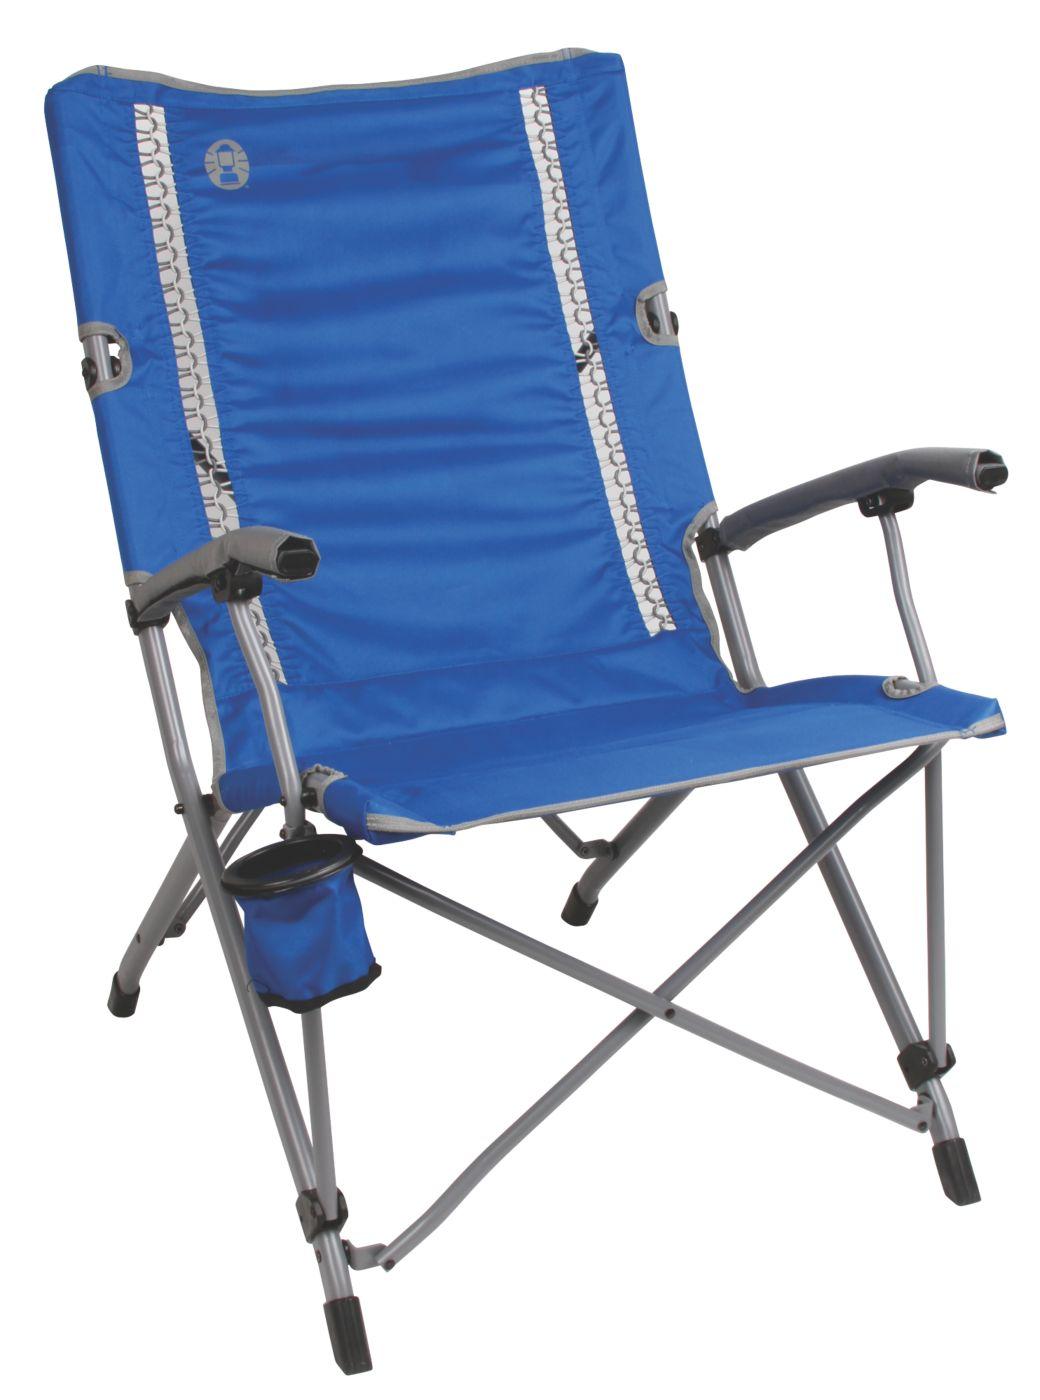 coleman folding chairs dental chair dwg camping comfortsmart interlock suspension